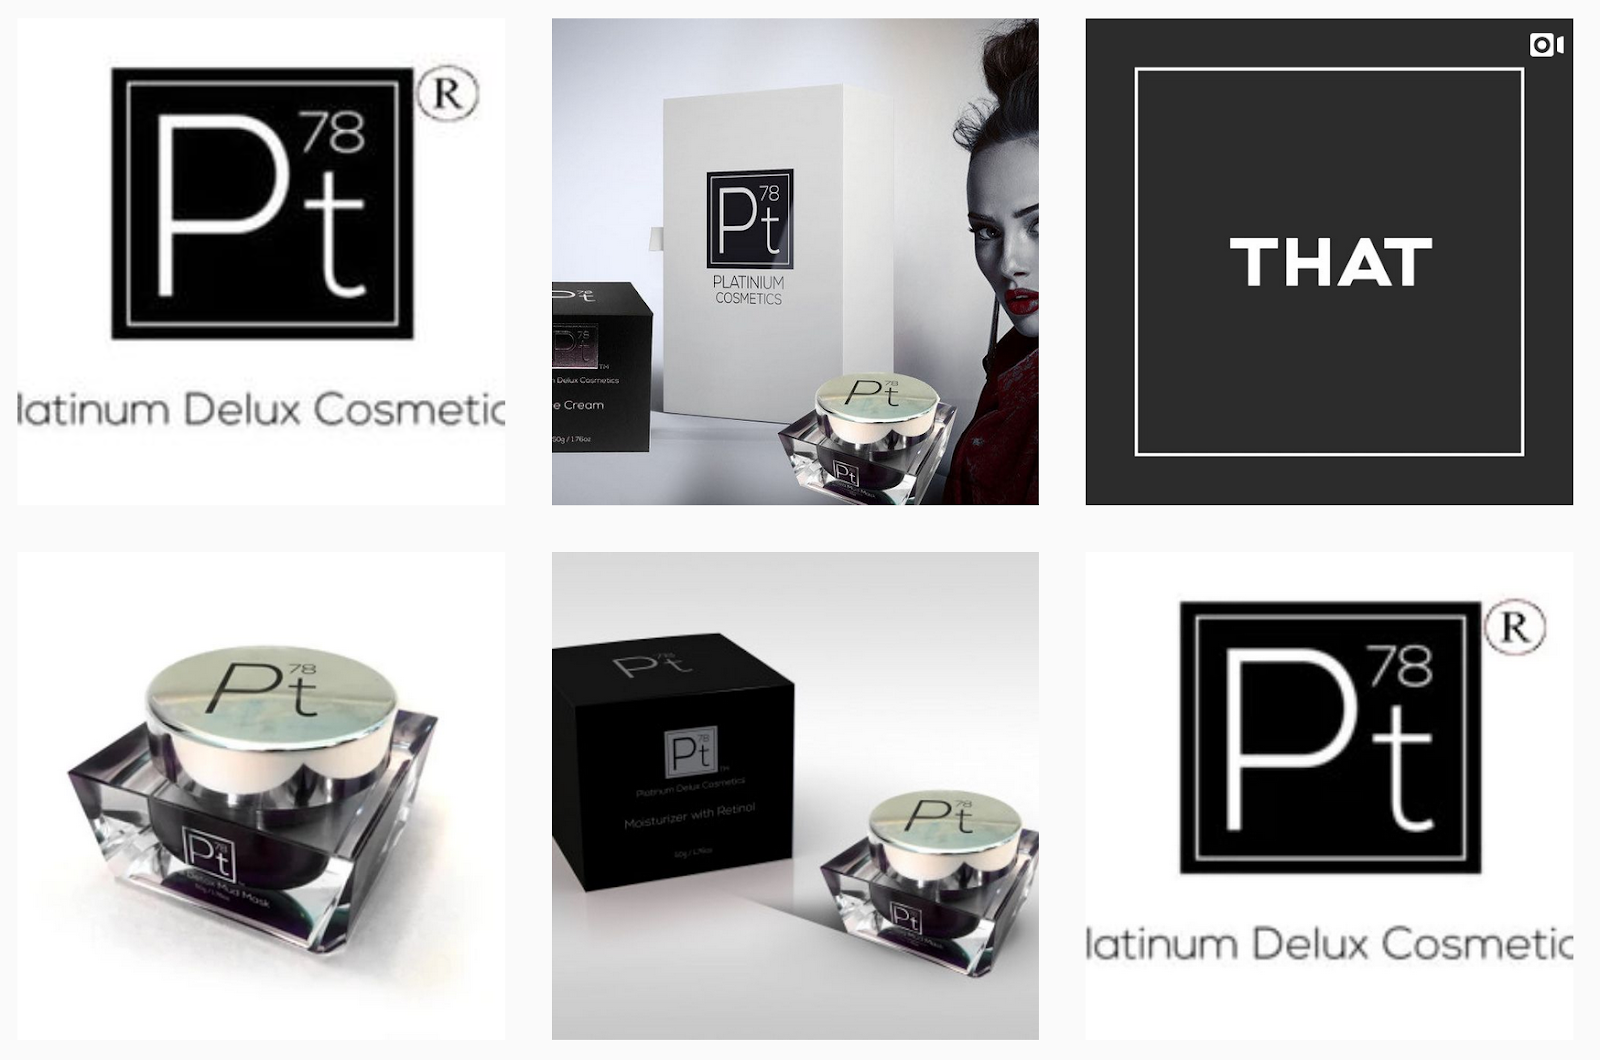 Platinum Deluxe Cosmetics   Image Gallery